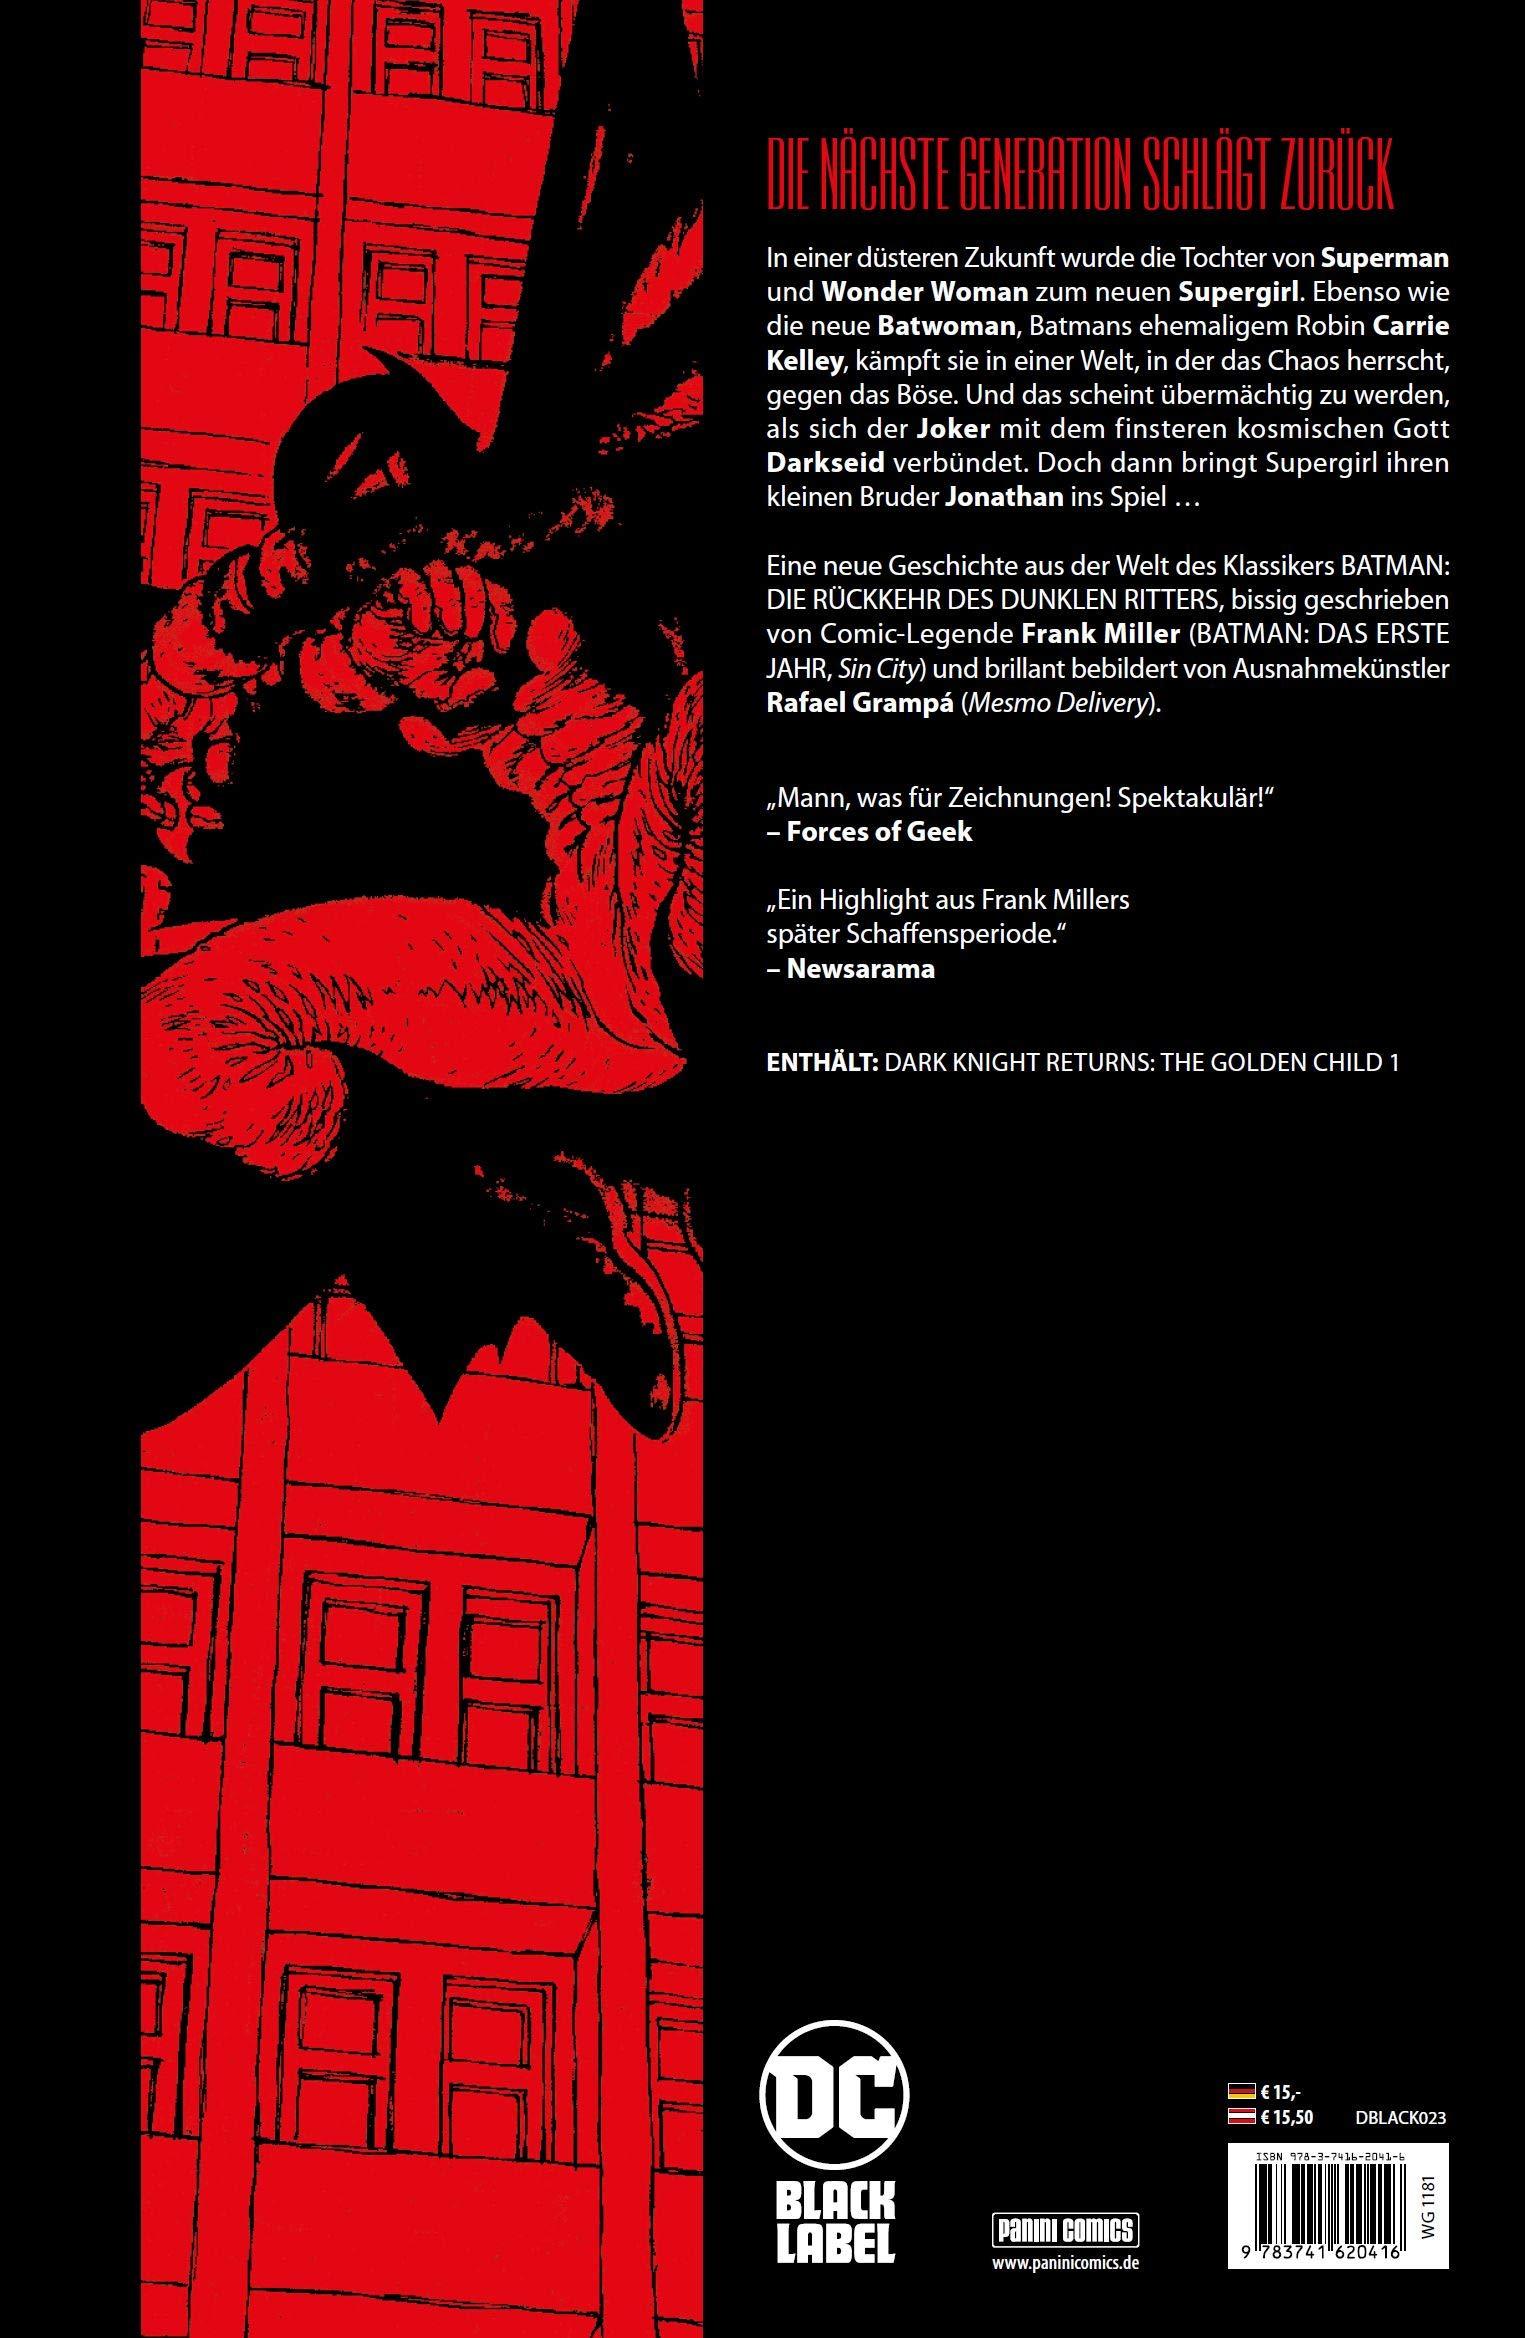 Batman: Das Goldene Kind: Amazon.es: Miller, Frank, Grampá, Rafael, Hidalgo, Carolin: Libros en idiomas extranjeros